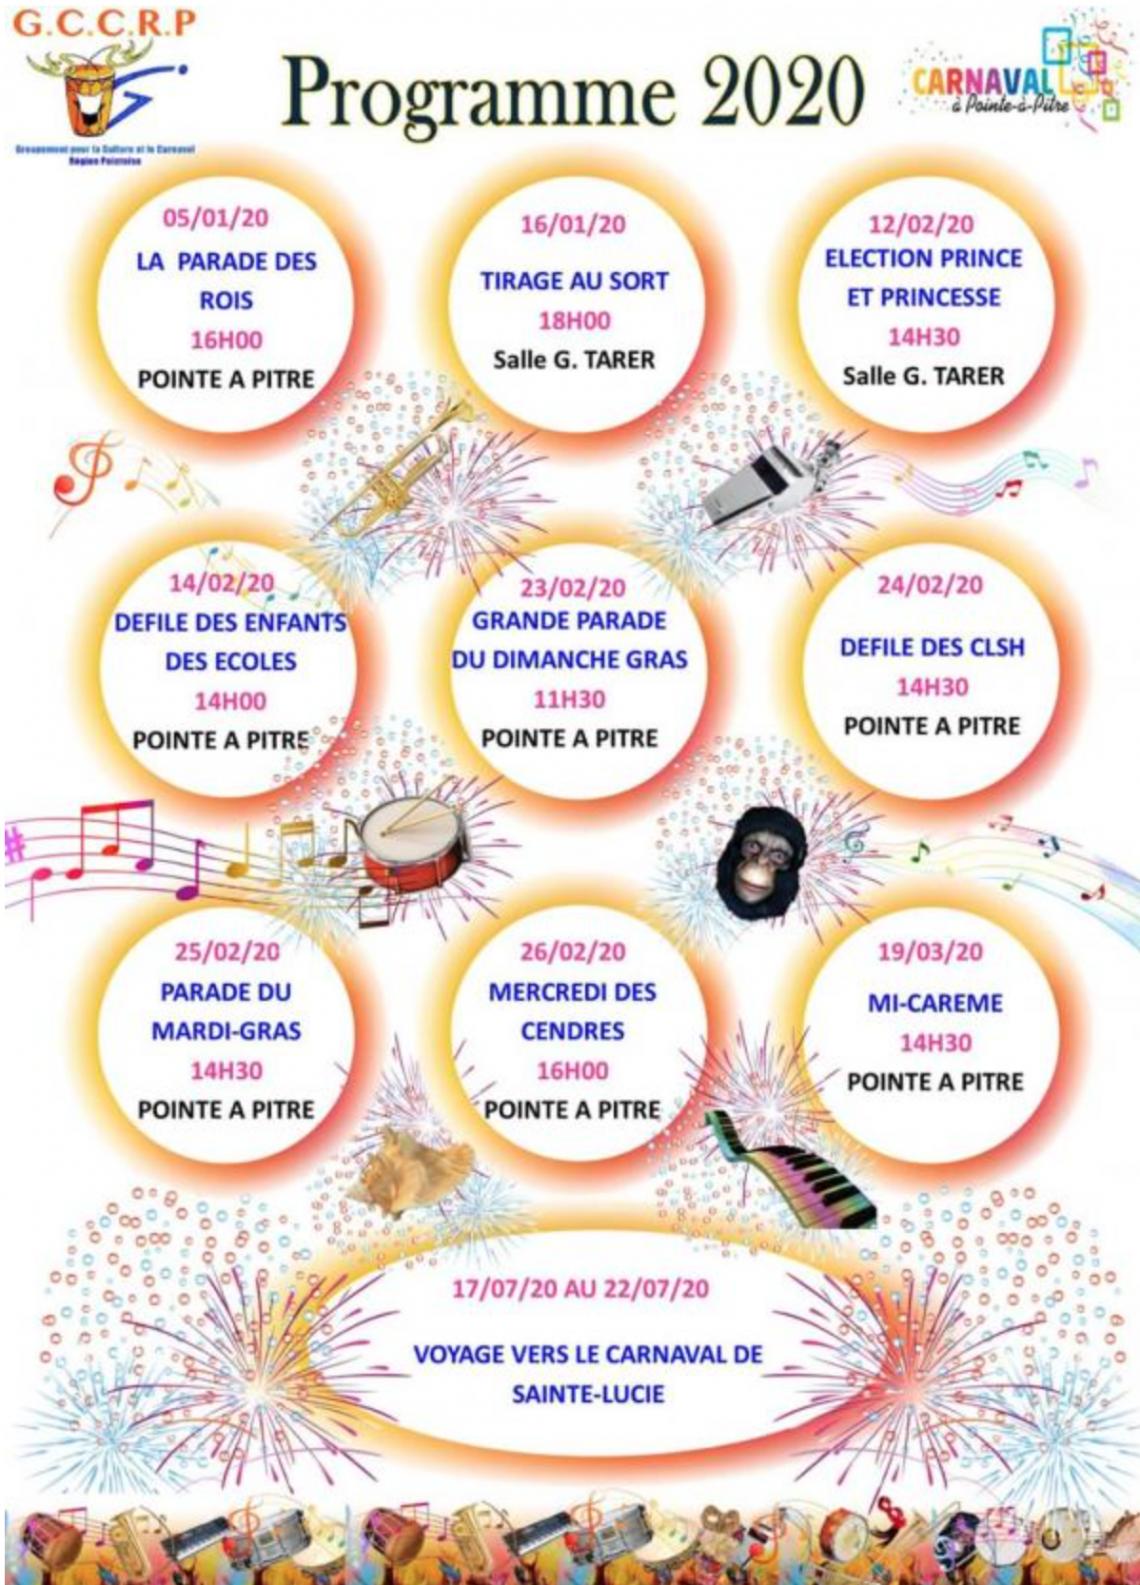 MAS KA KLÉ : MAS A LANNUIT 2020 – Carnaval Guadeloupe